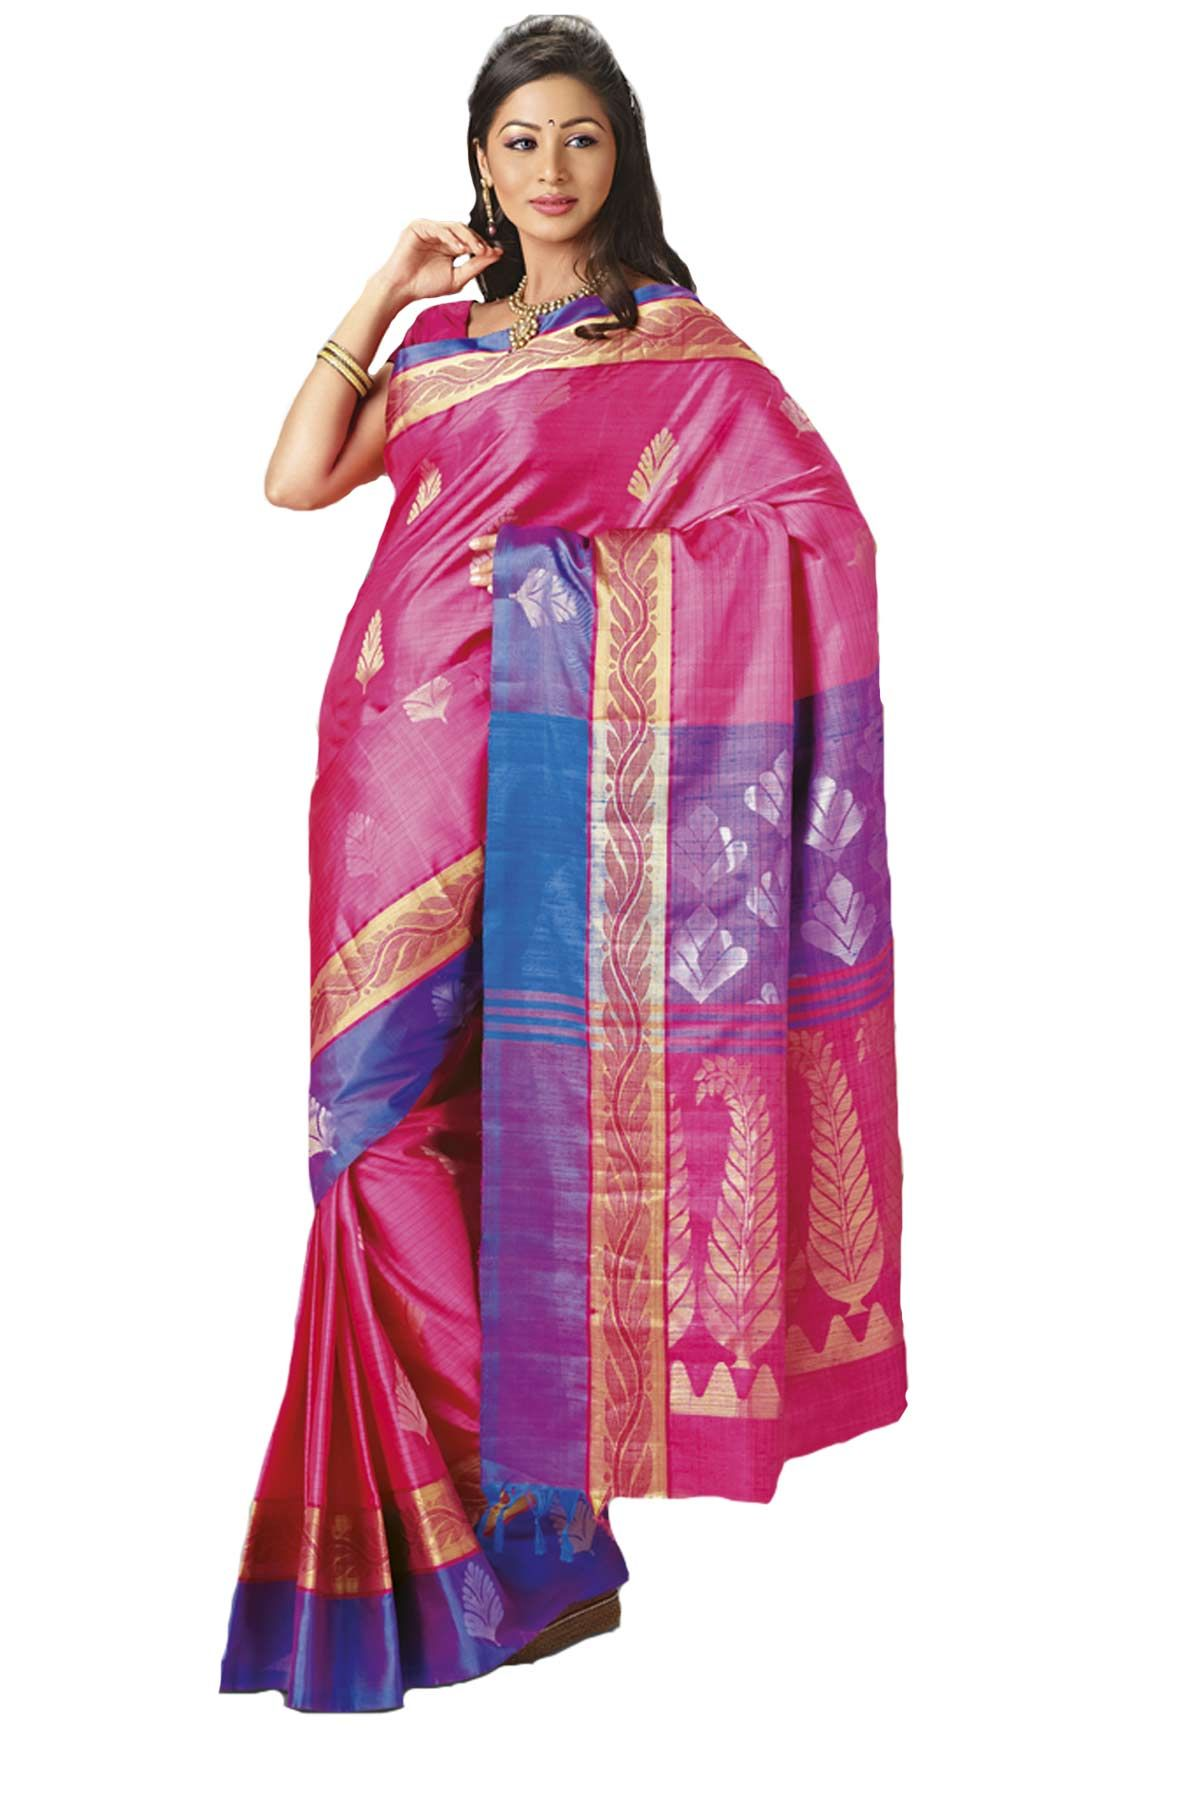 Saree images paithani mesmerizing multi colour pure silk zari weaved saree in purple